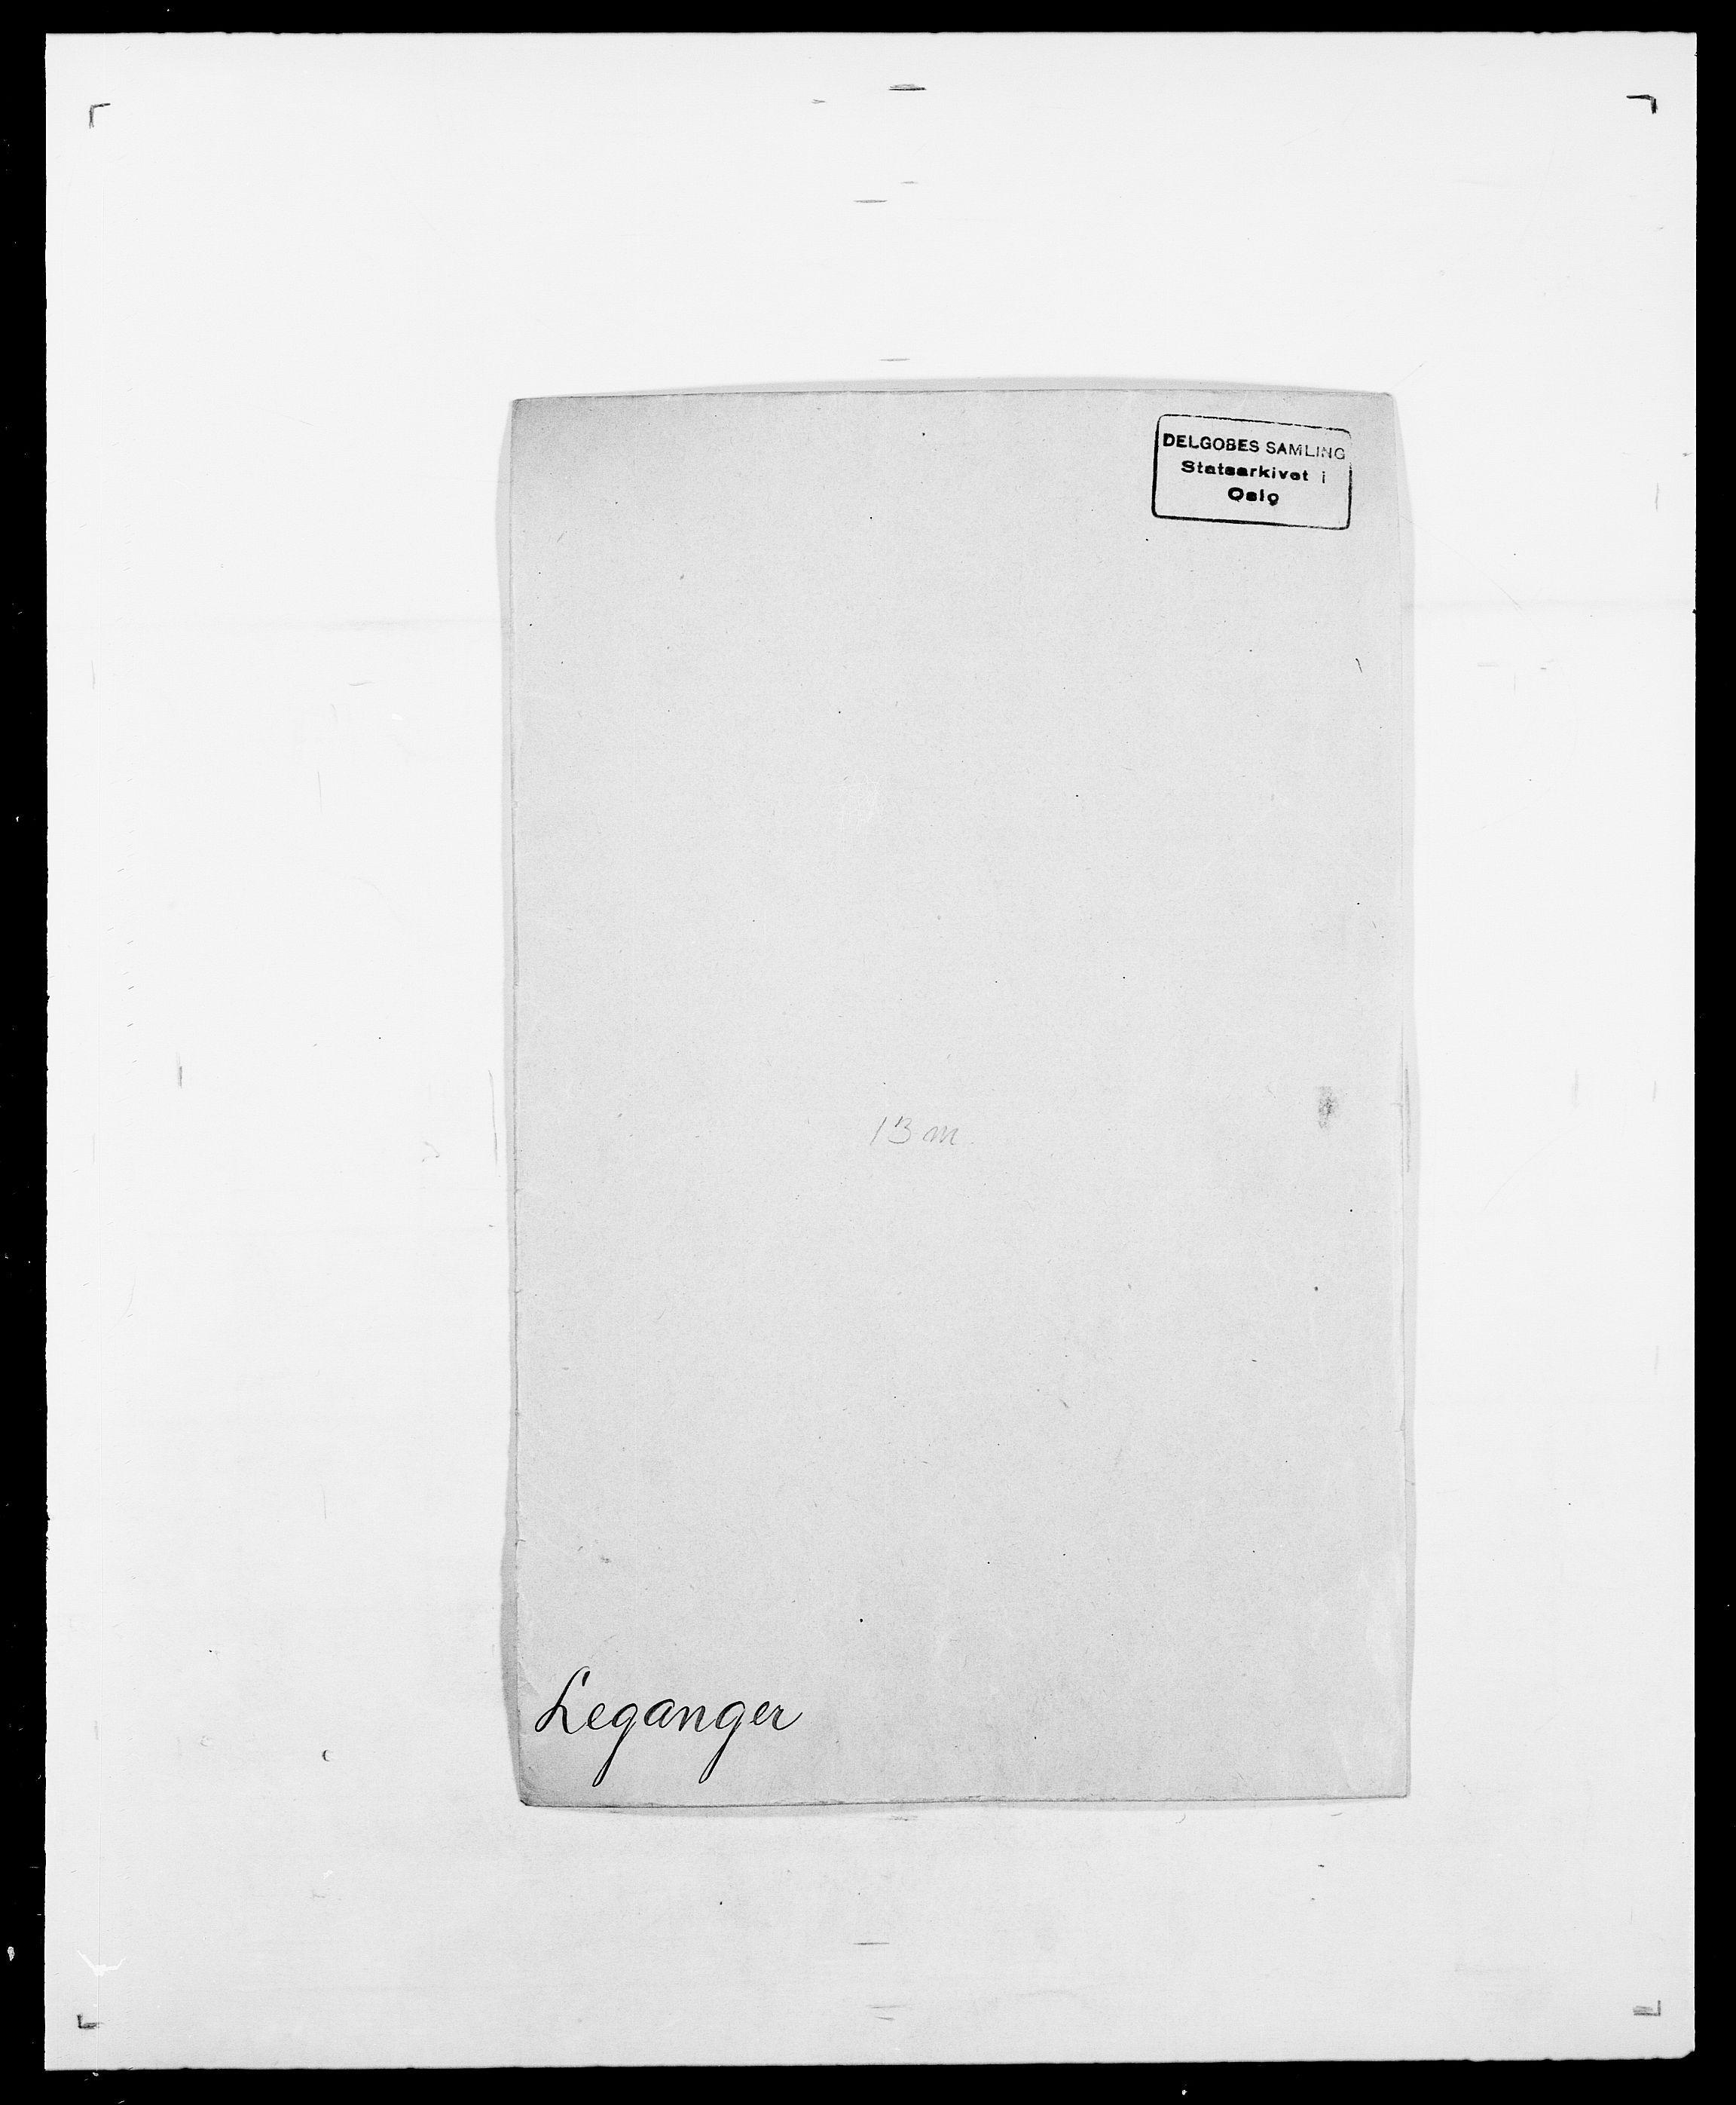 SAO, Delgobe, Charles Antoine - samling, D/Da/L0023: Lau - Lirvyn, s. 92